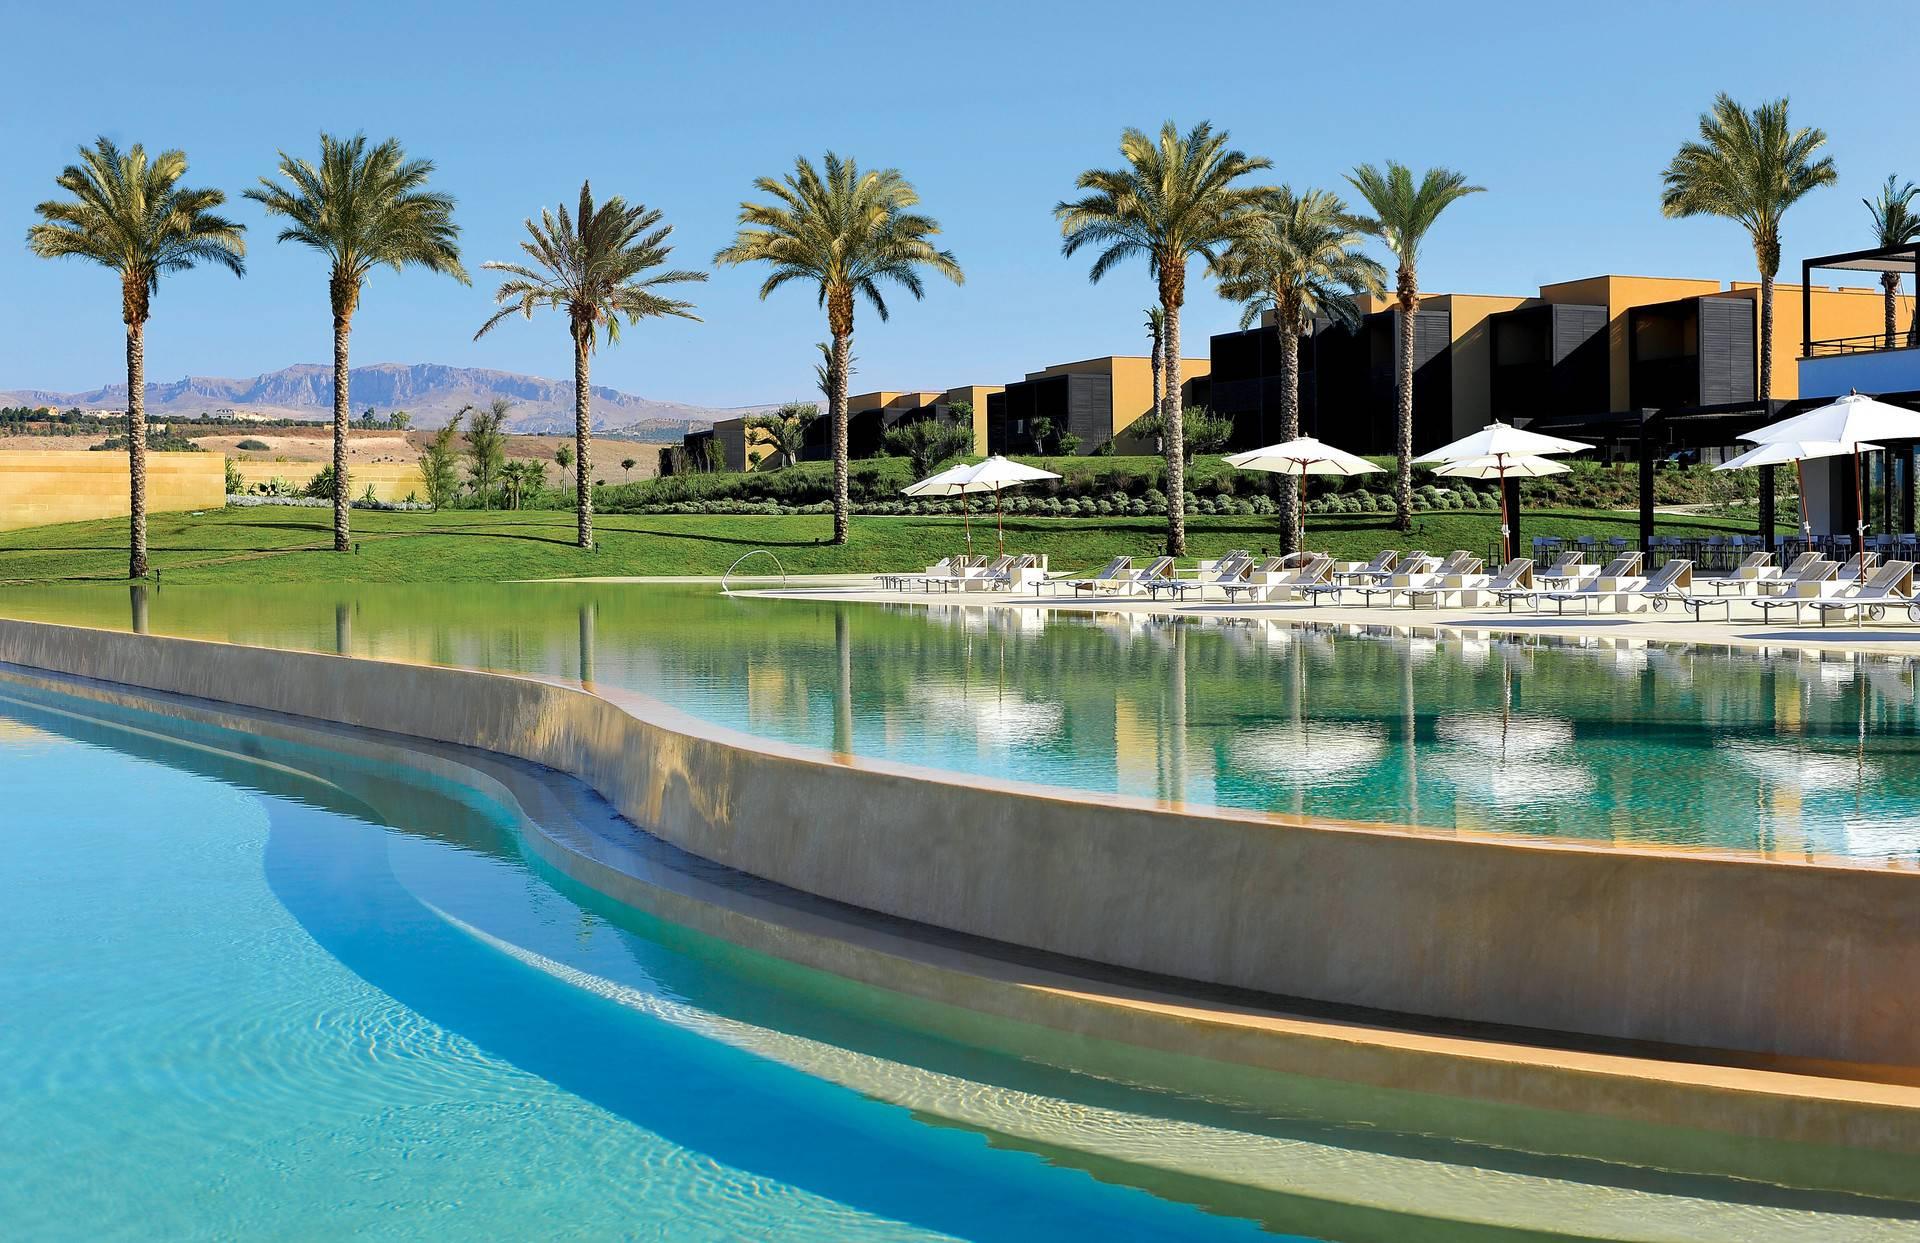 The resorts main pool